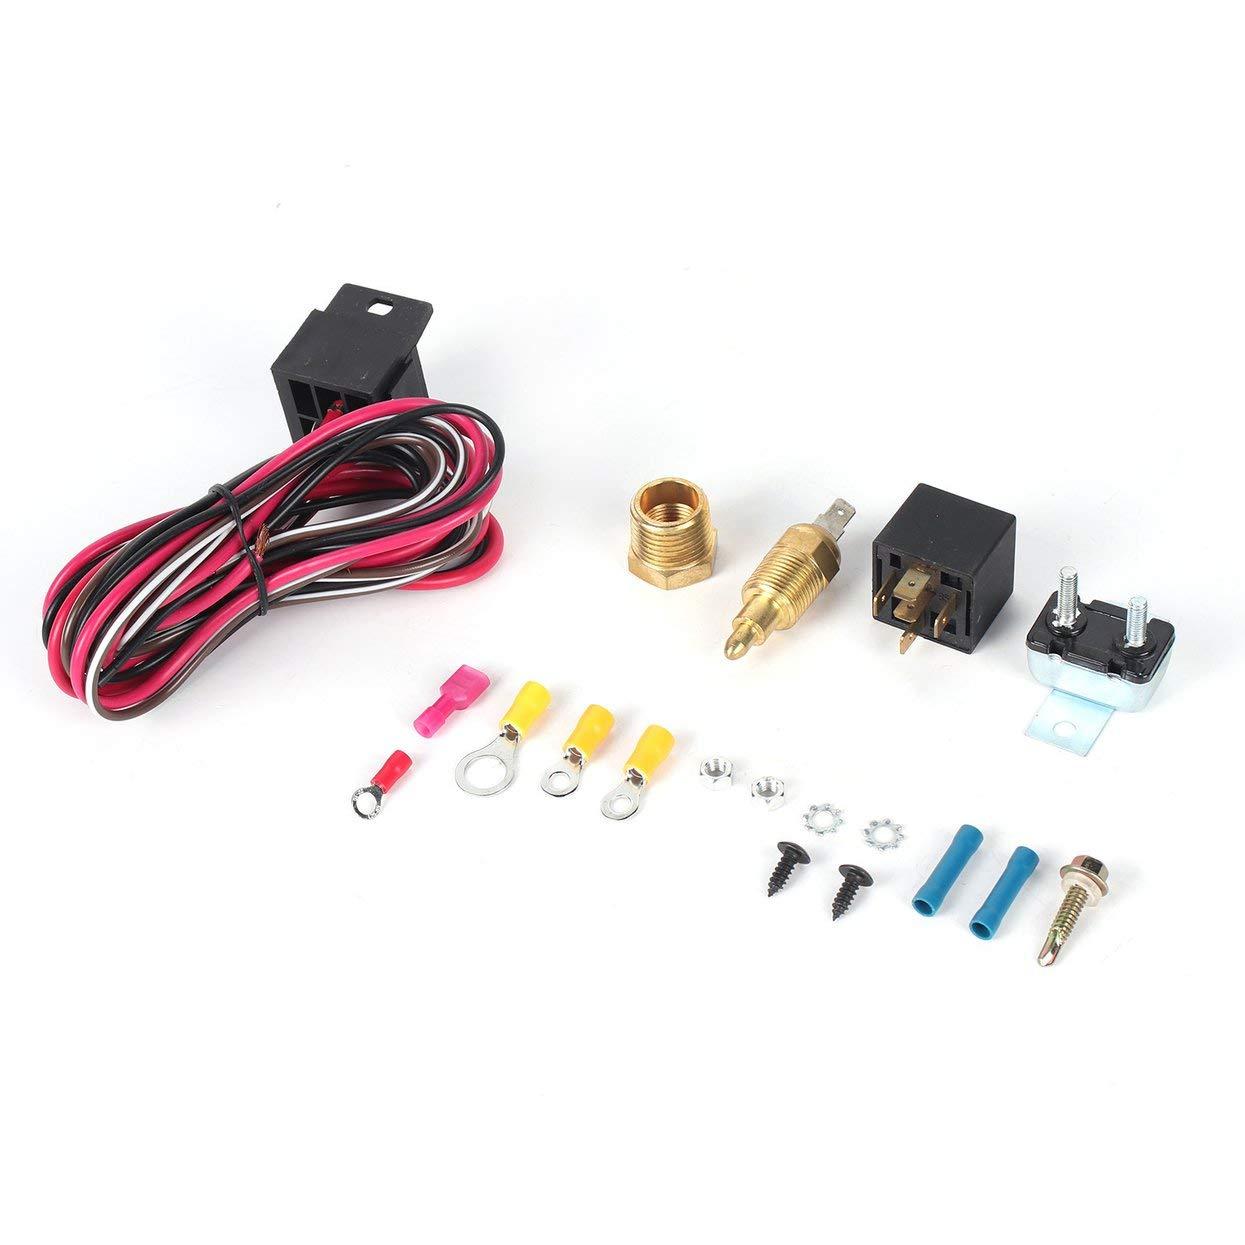 sbc thermostat wiring lamijua electric fan wiring install kit complete thermostat 50 amp  lamijua electric fan wiring install kit